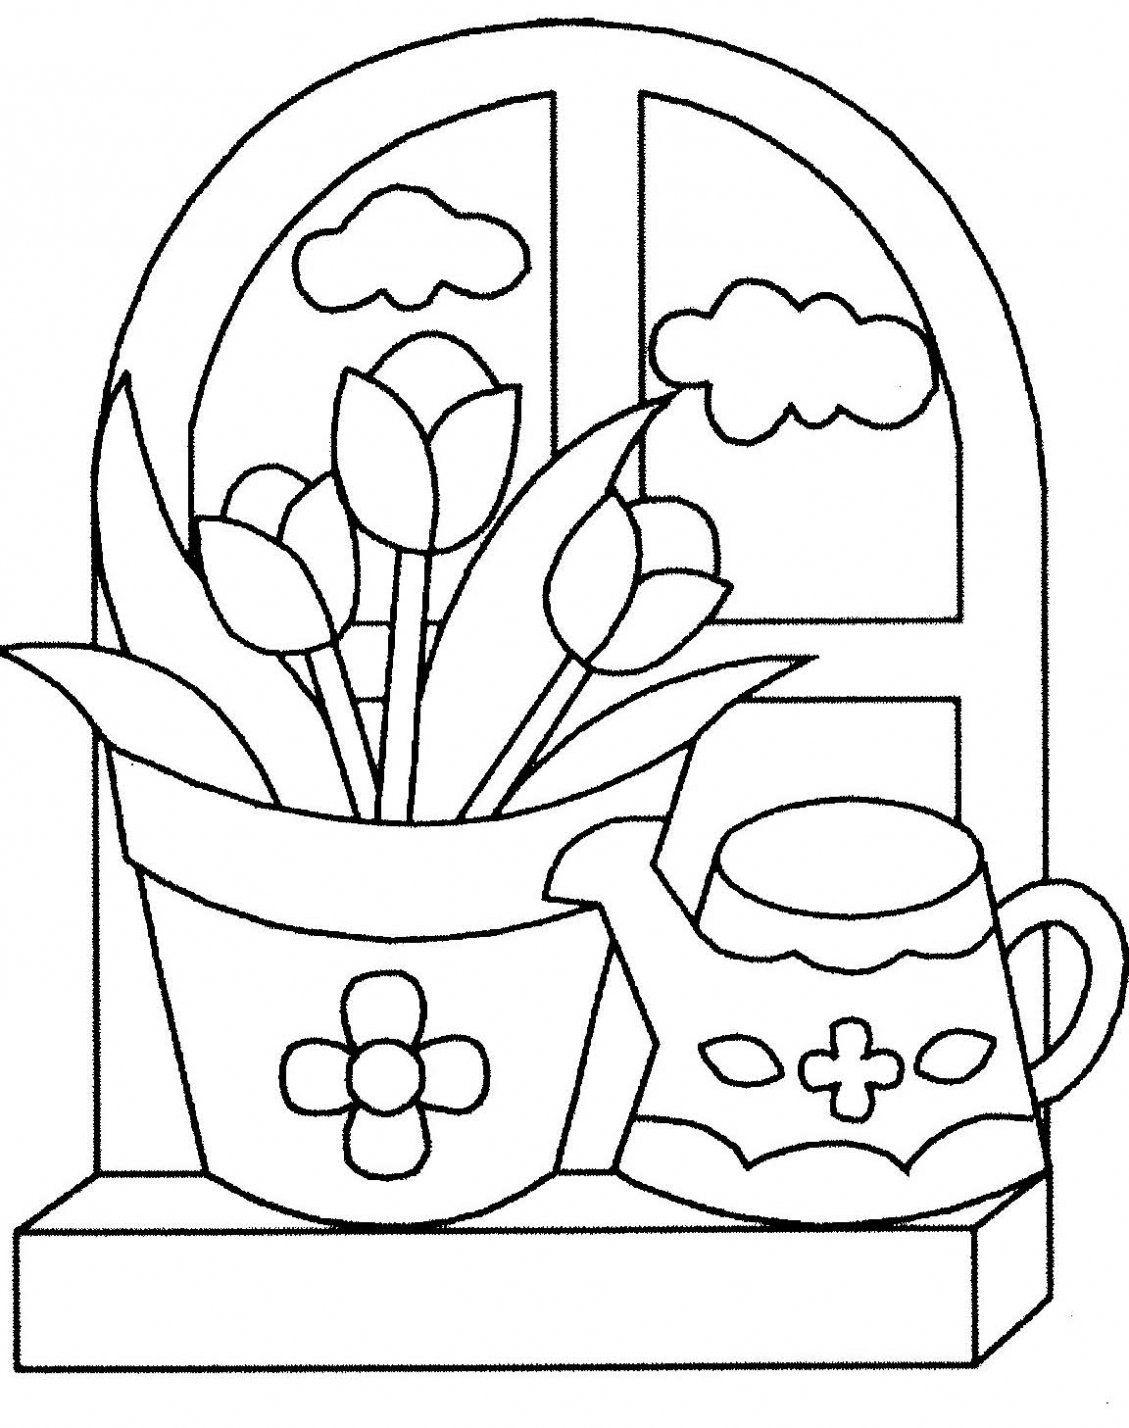 tipos-de-dibujos-de-flores-para-colorear-e-imprimir-para-ninos ...